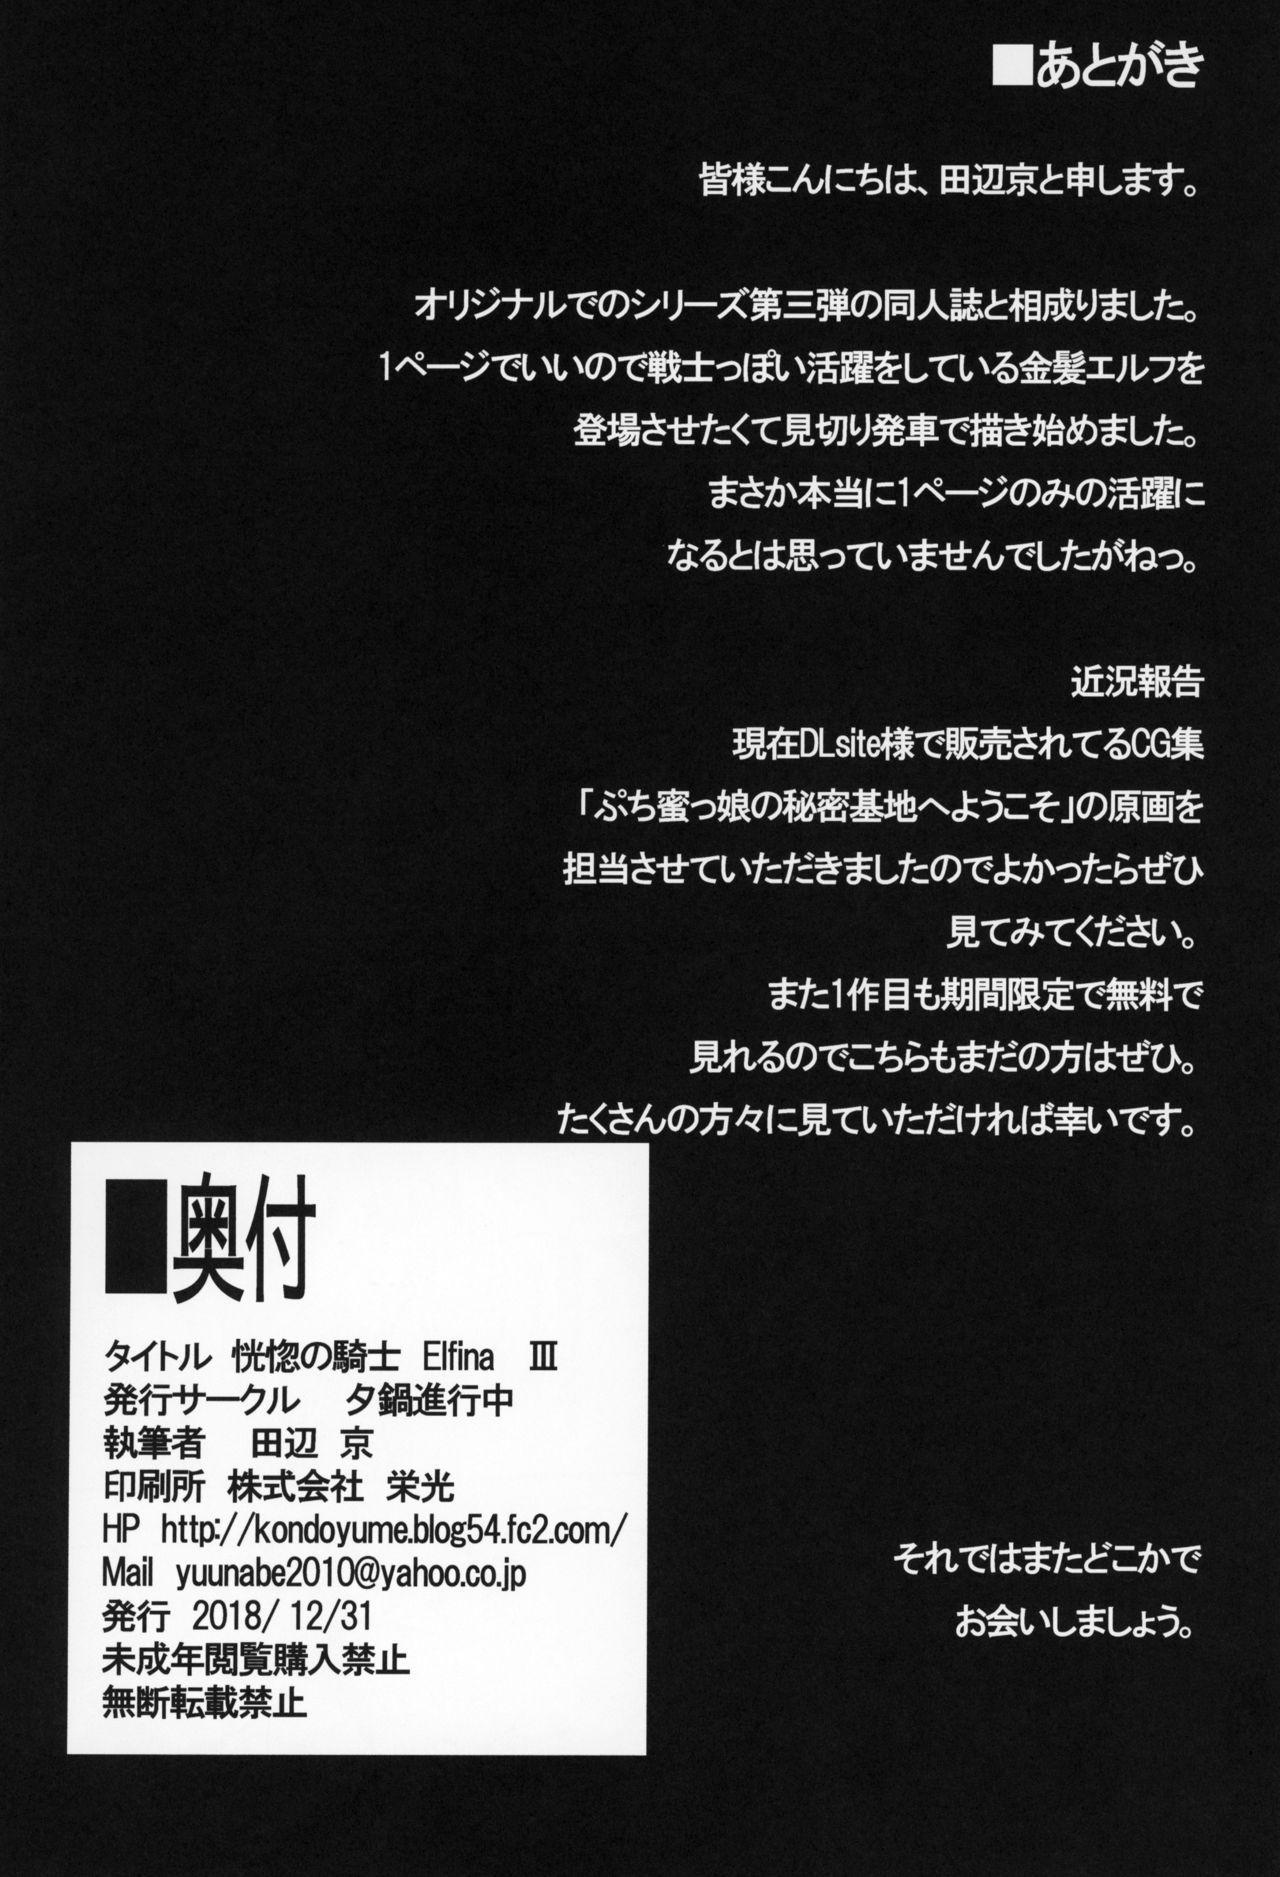 Koukotsu no Kishi Elfina III 24